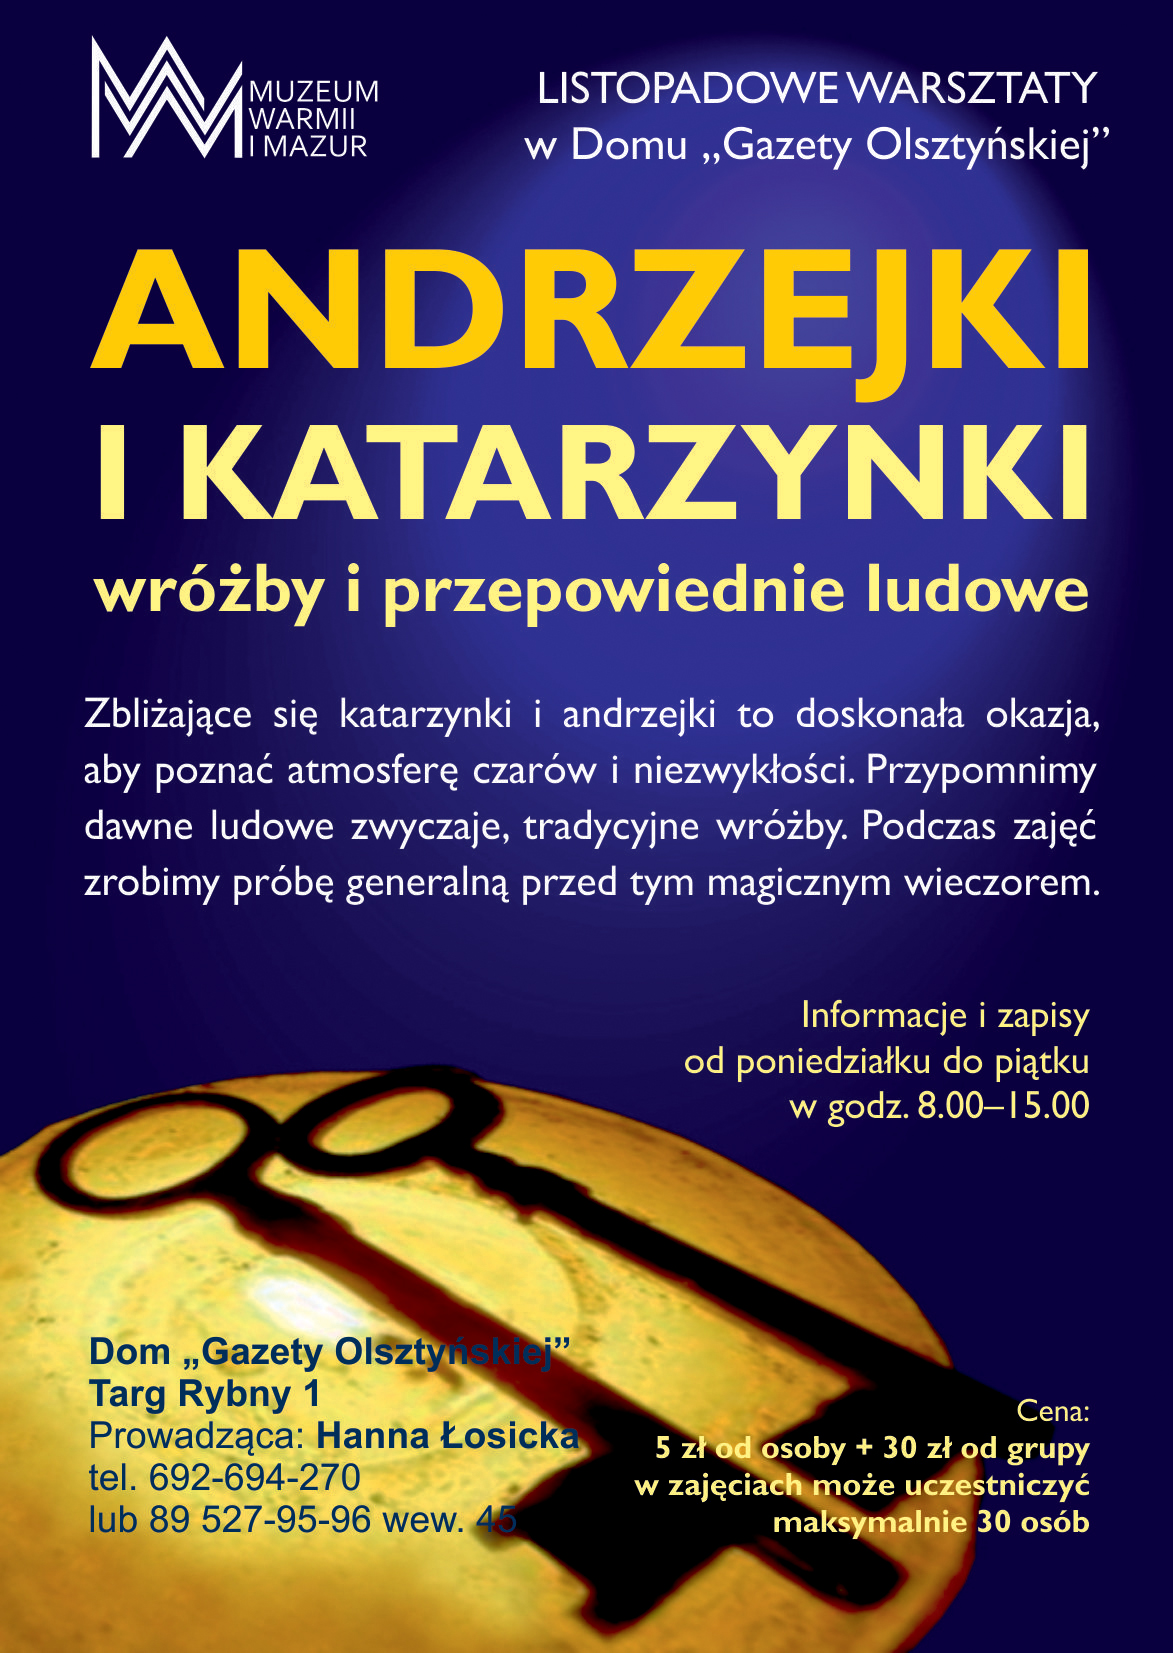 http://m.wmwm.pl/2017/10/orig/dom-gazety-katarzynki-2017-5898.jpg